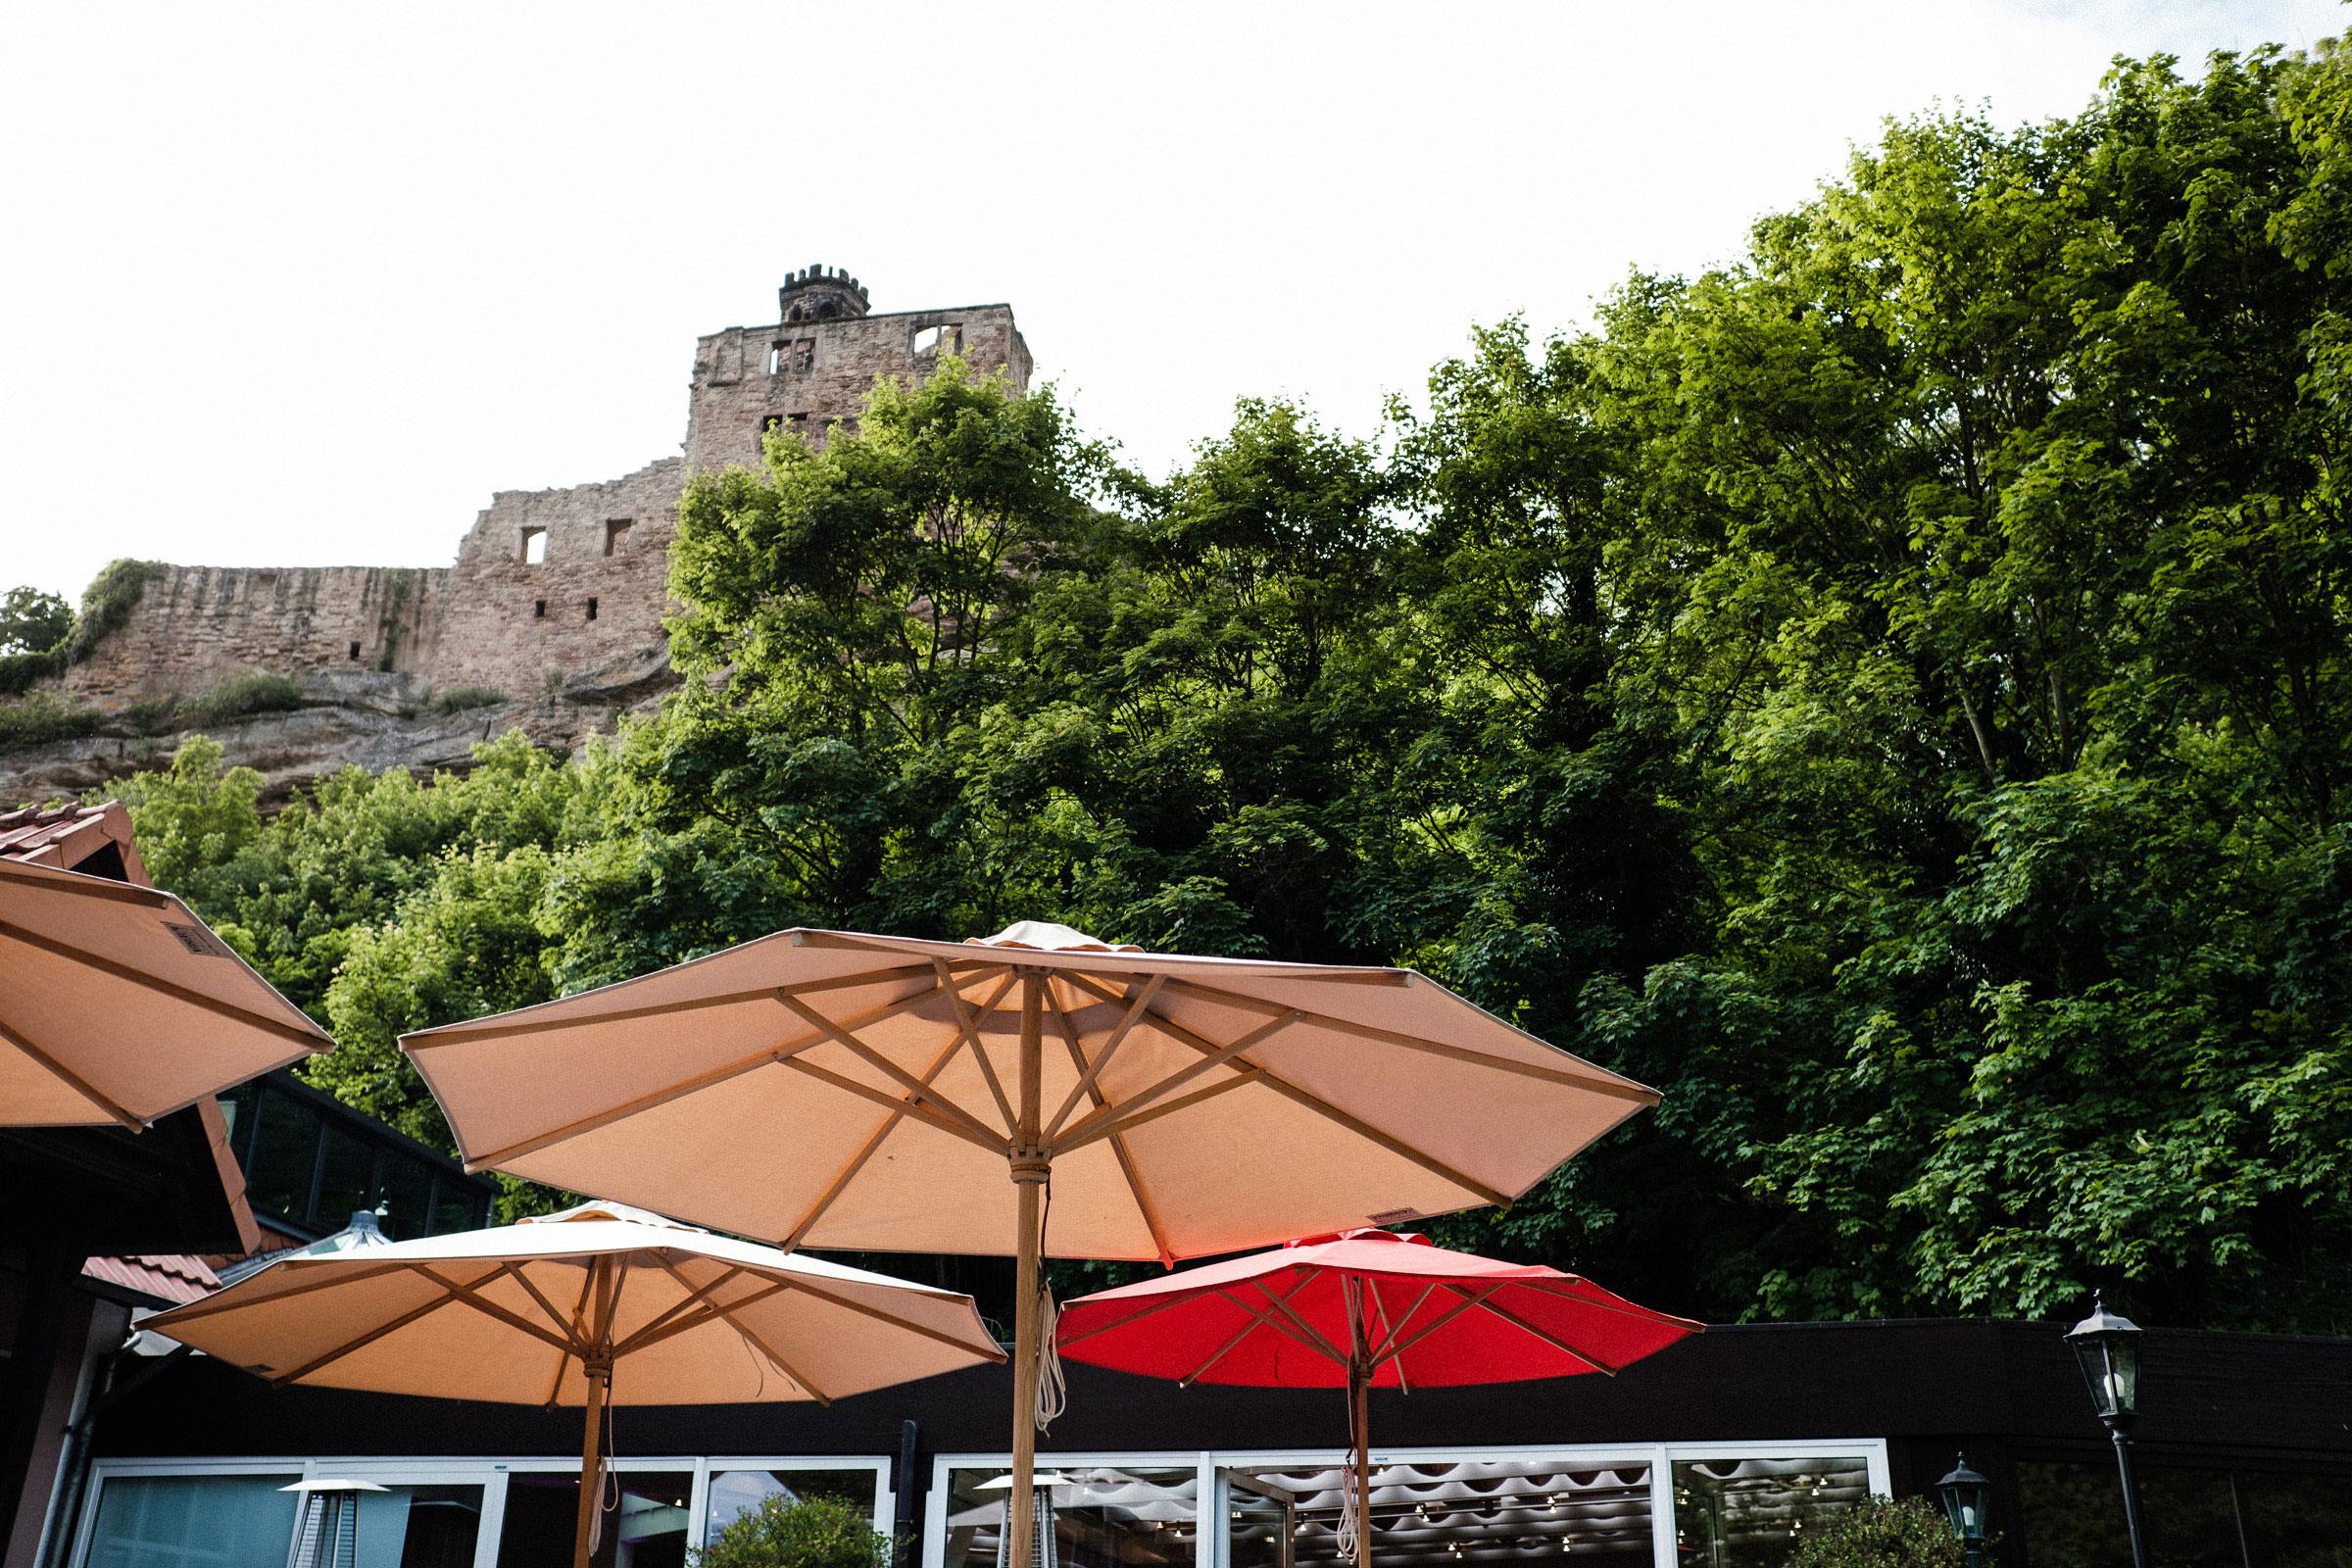 Burghotel Hardenberg am Fuß der Burgruine